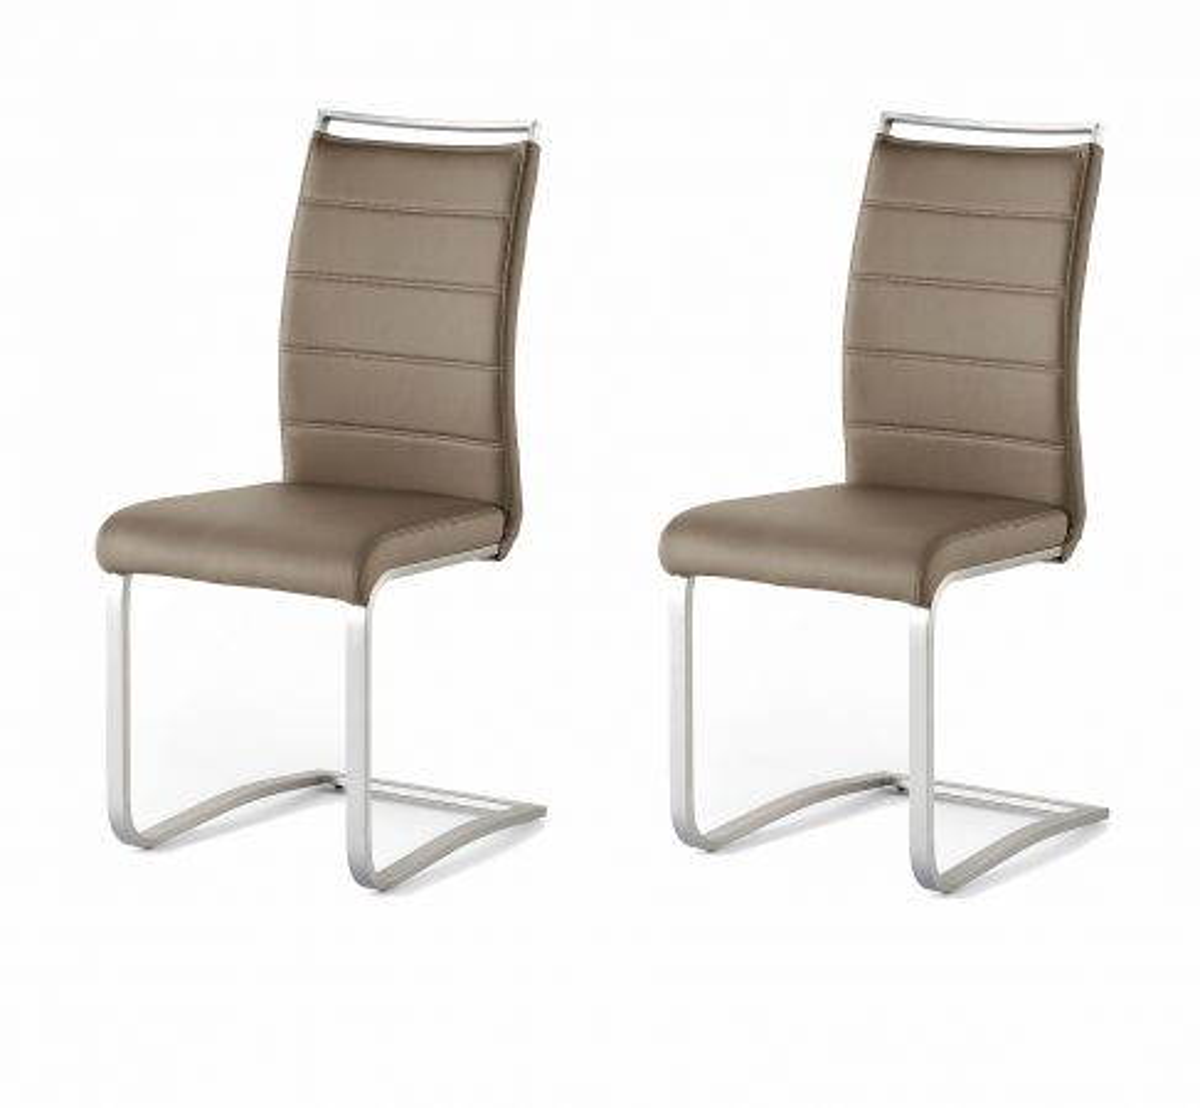 2 x Stuhl Pescara Cappuccino Schwinger Kunstleder